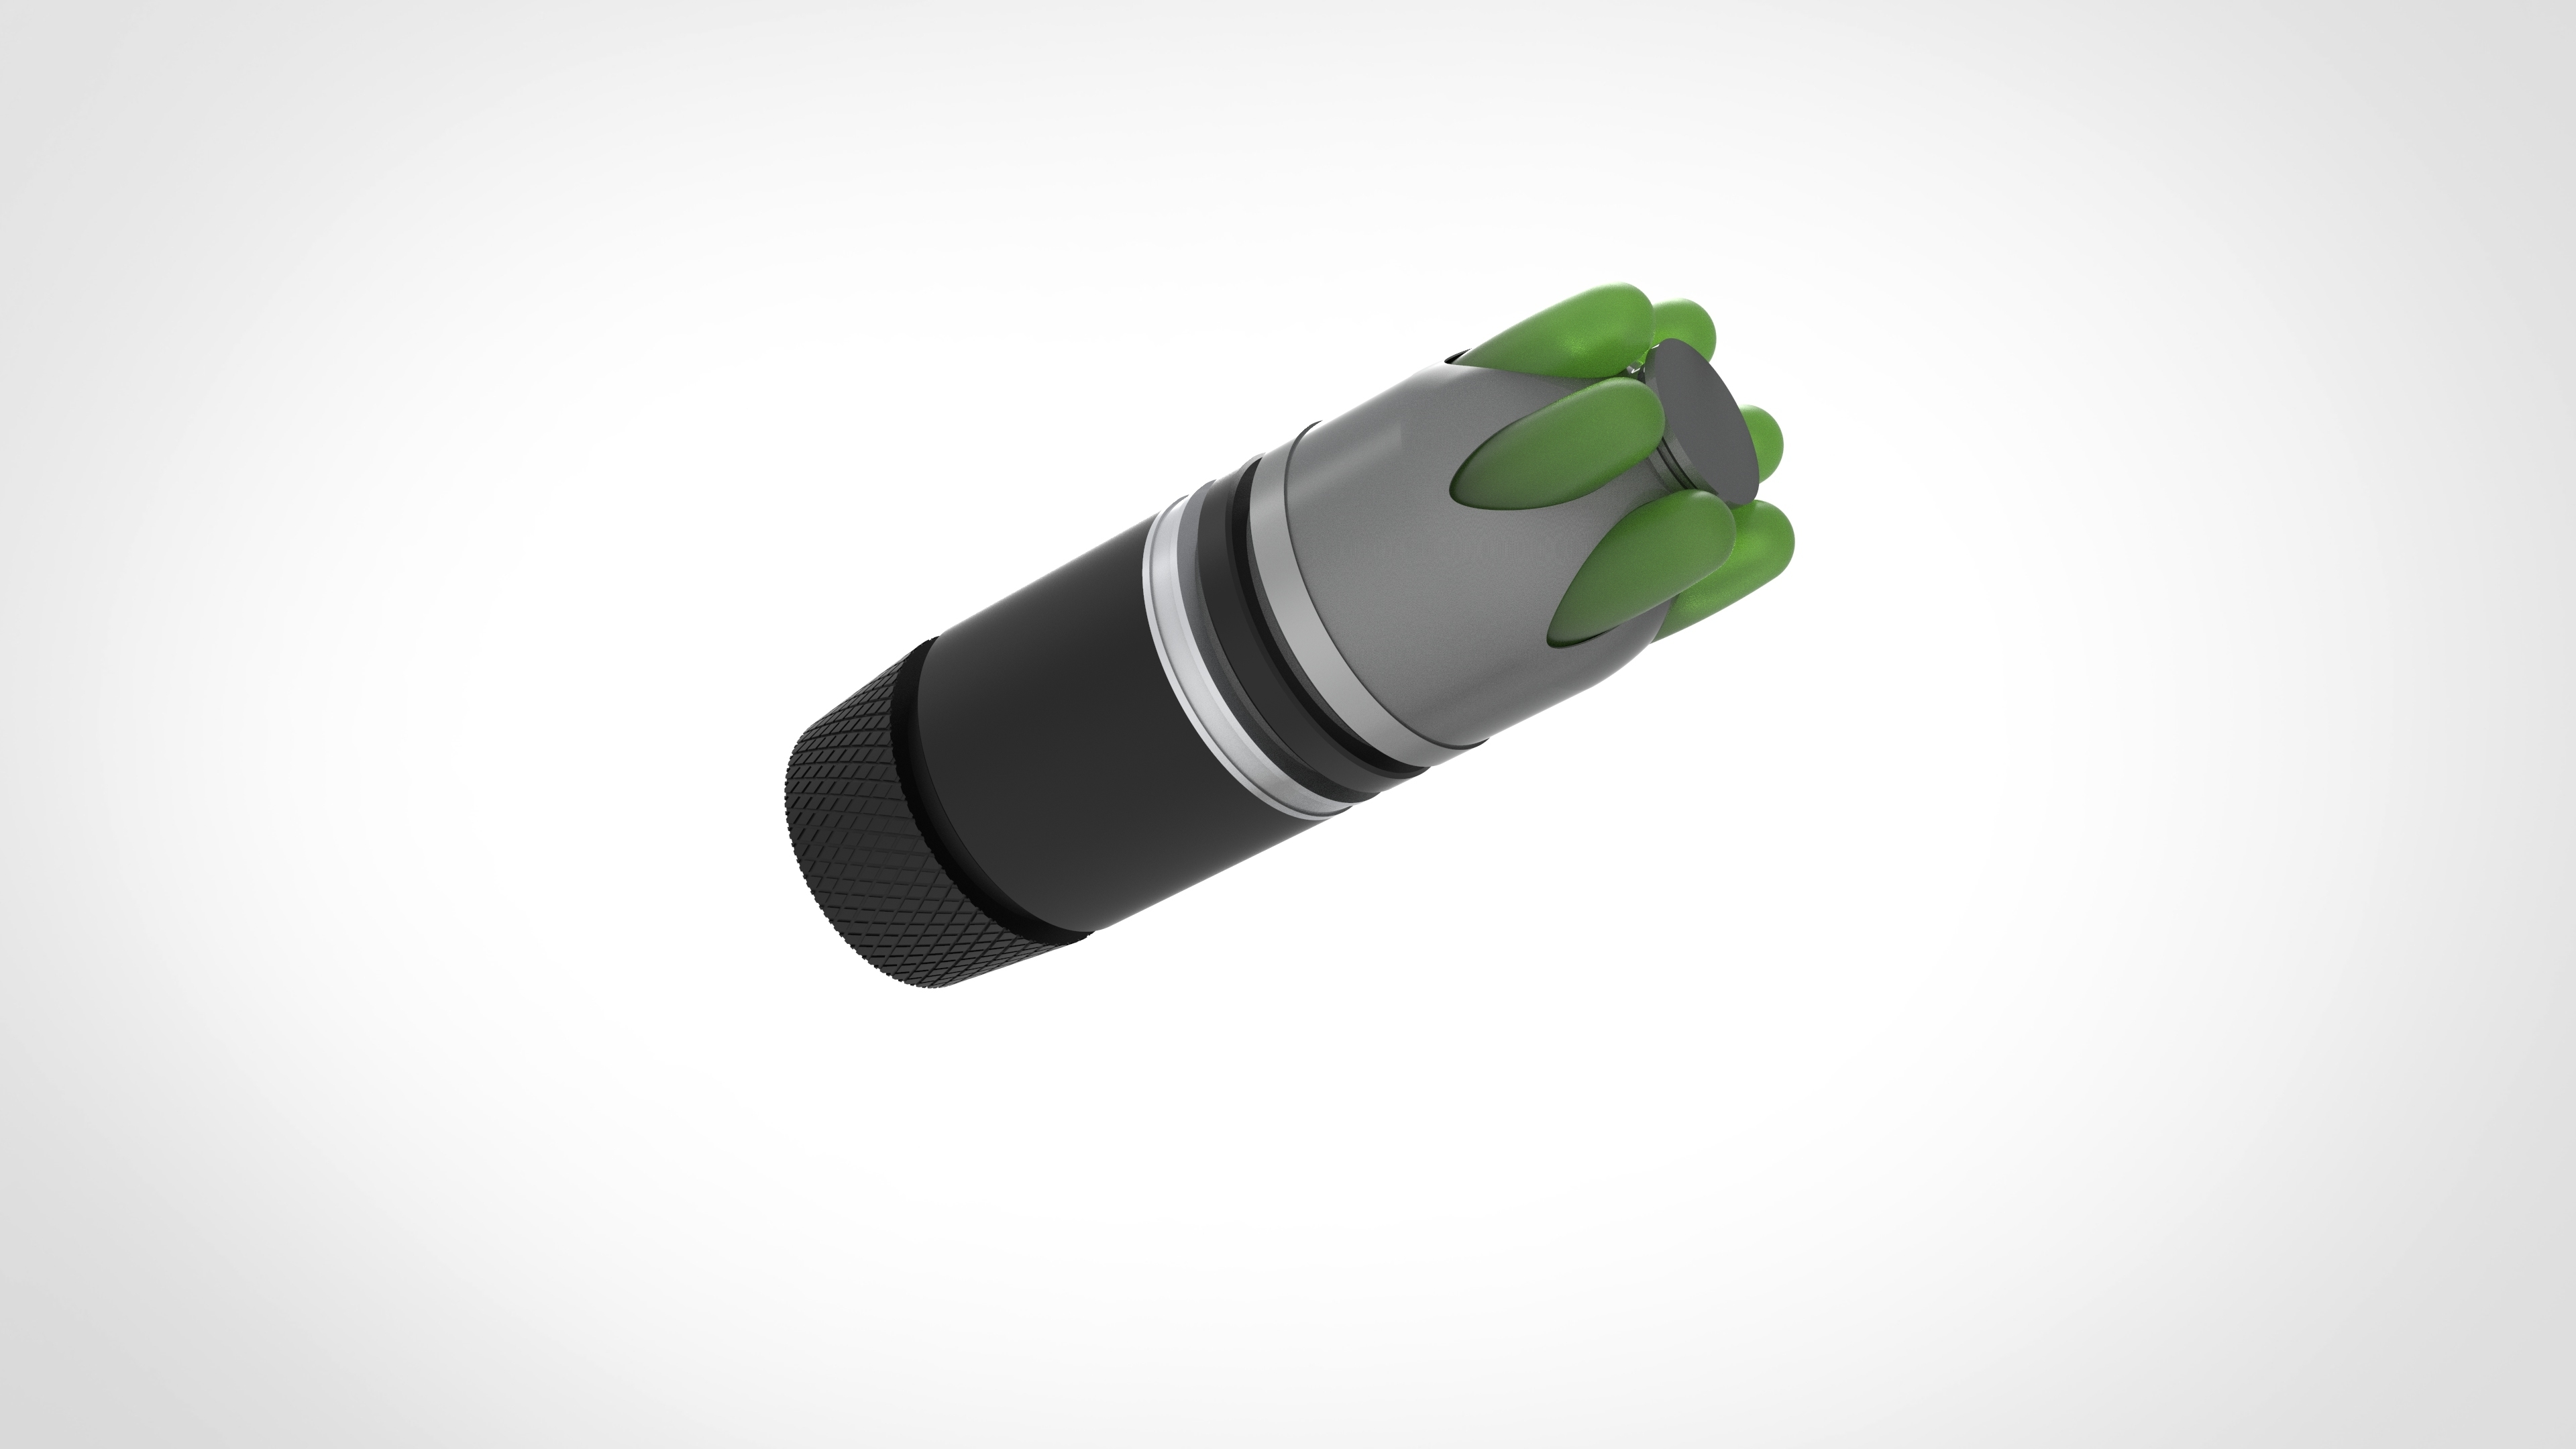 003.jpg Download 3MF file Glue grenade from the video game Batman: Arkham Origins • 3D printer model, vetrock